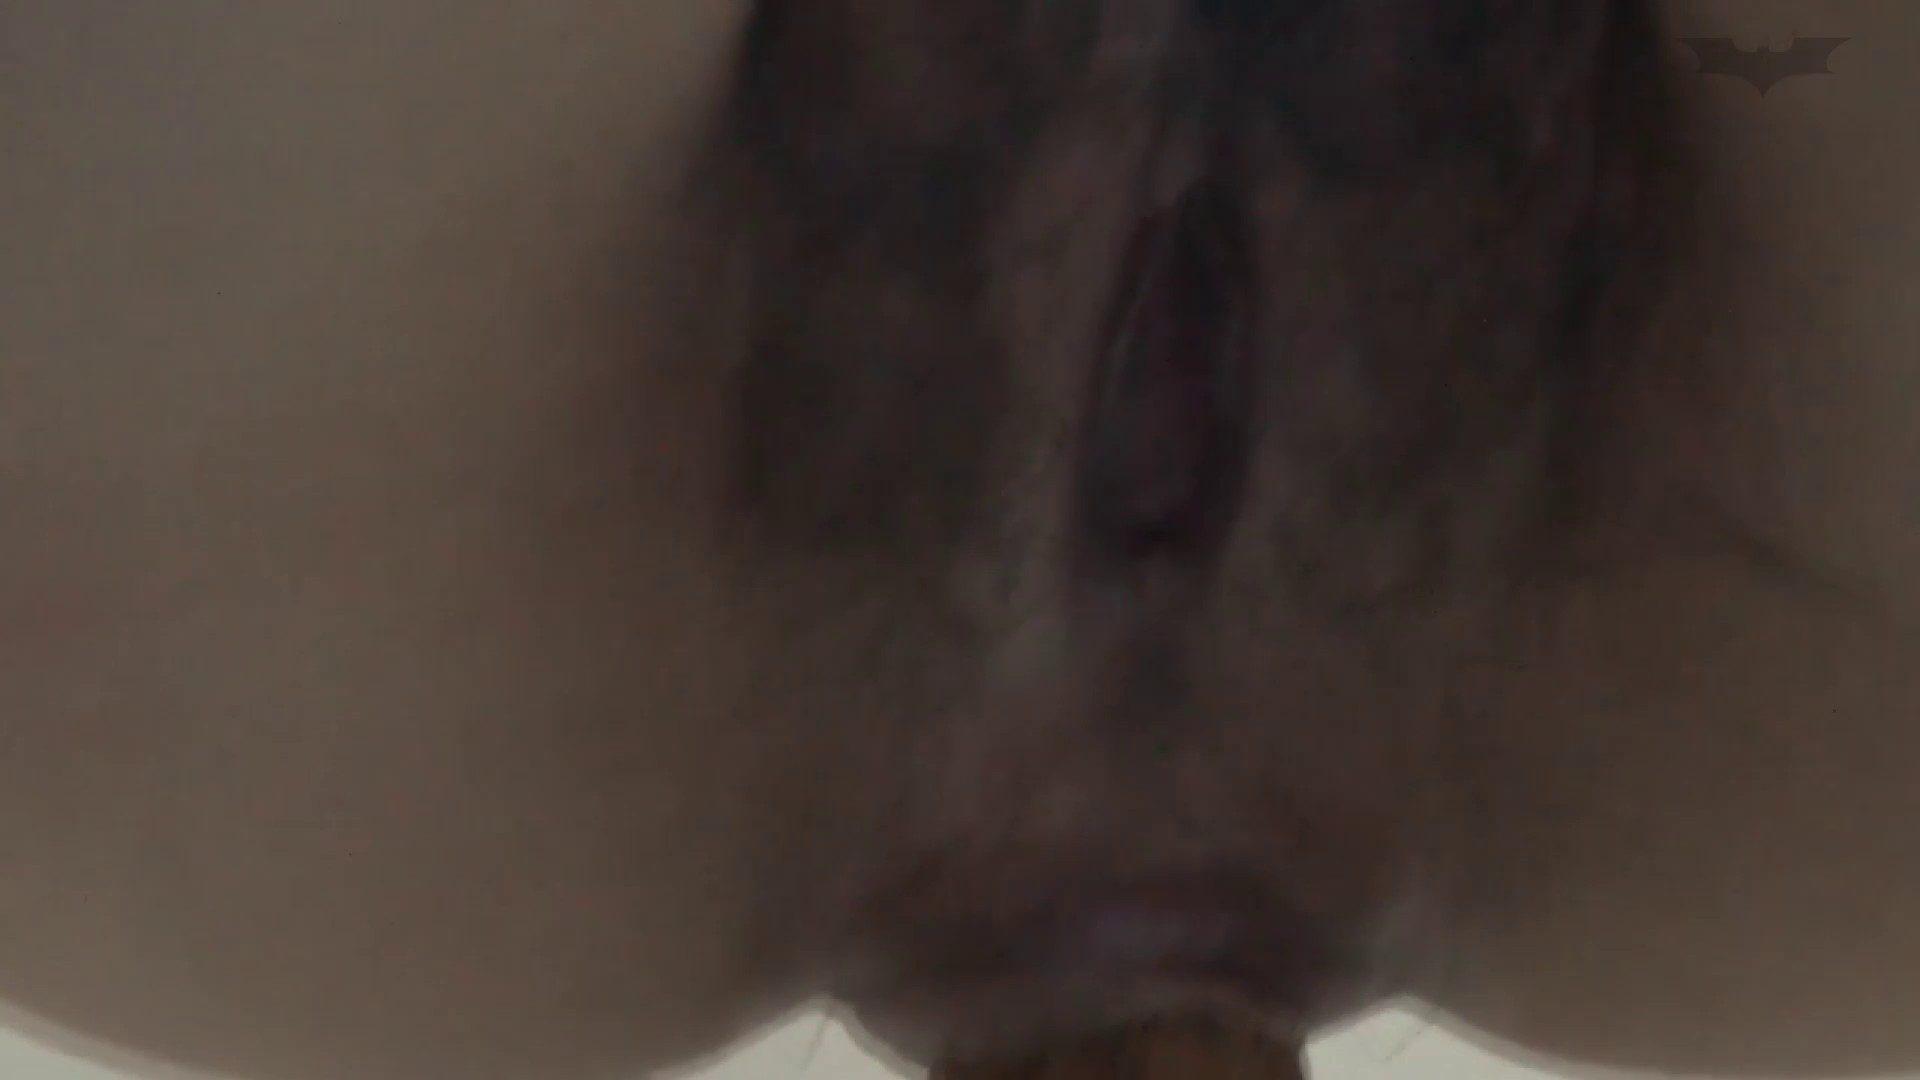 JD盗撮 美女の洗面所の秘密 Vol.64 細身女性 ワレメ動画紹介 81画像 6